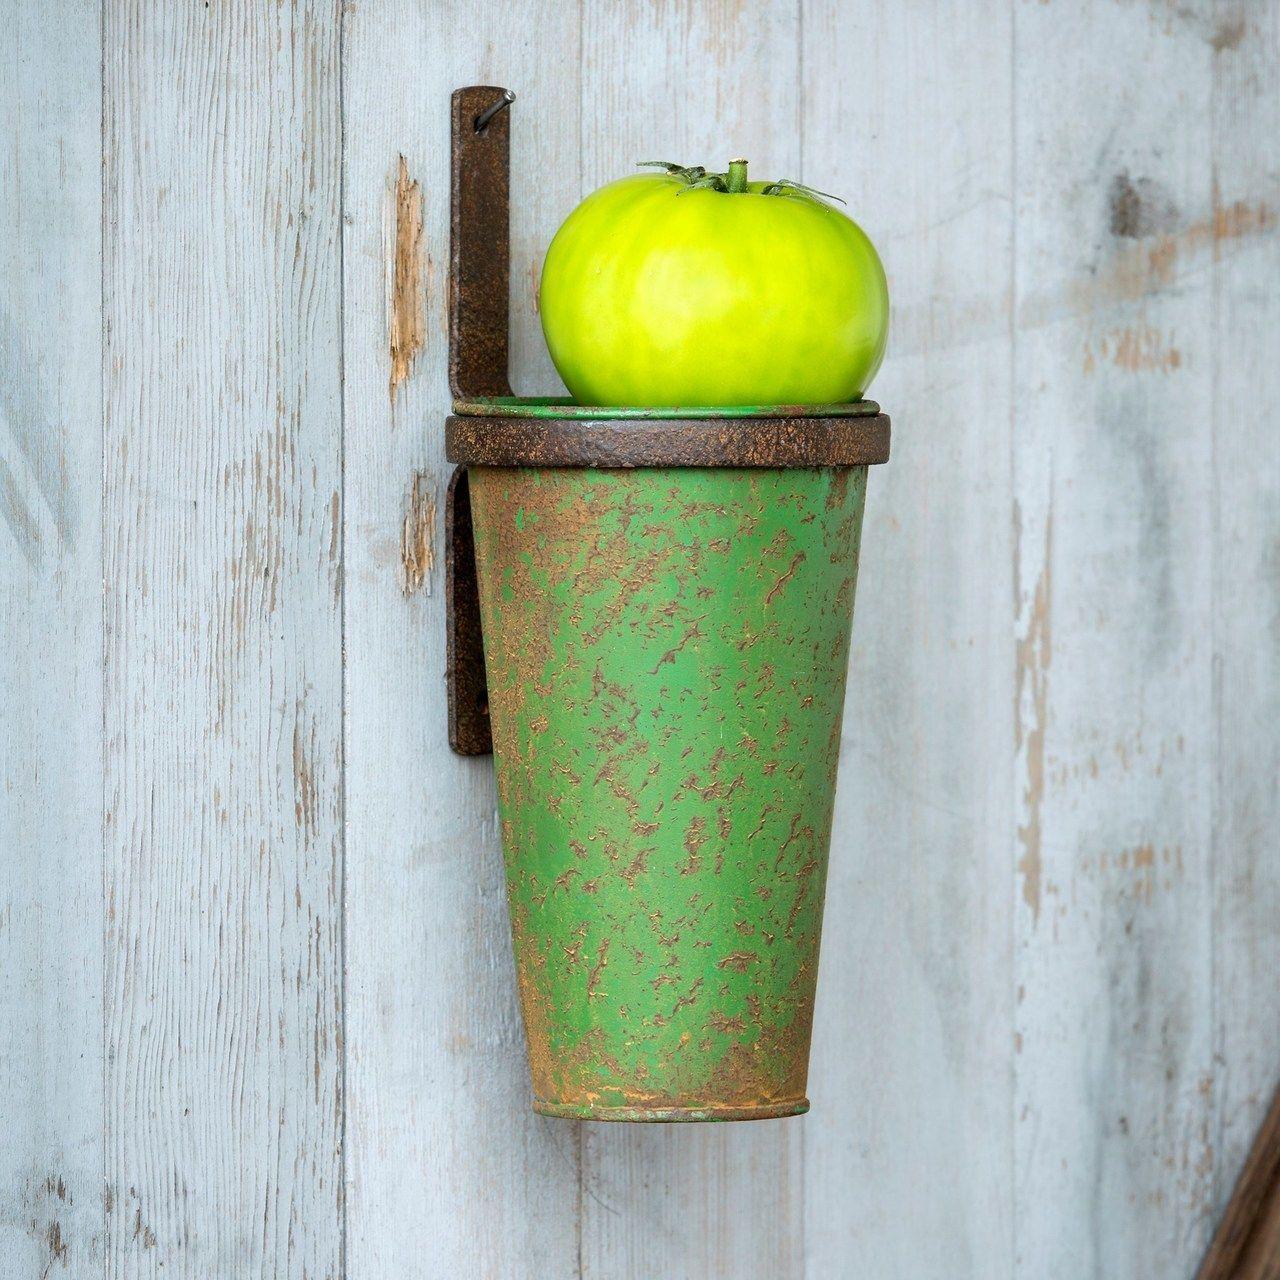 Metal Hanging Flower Vase with Bracket Marmalade